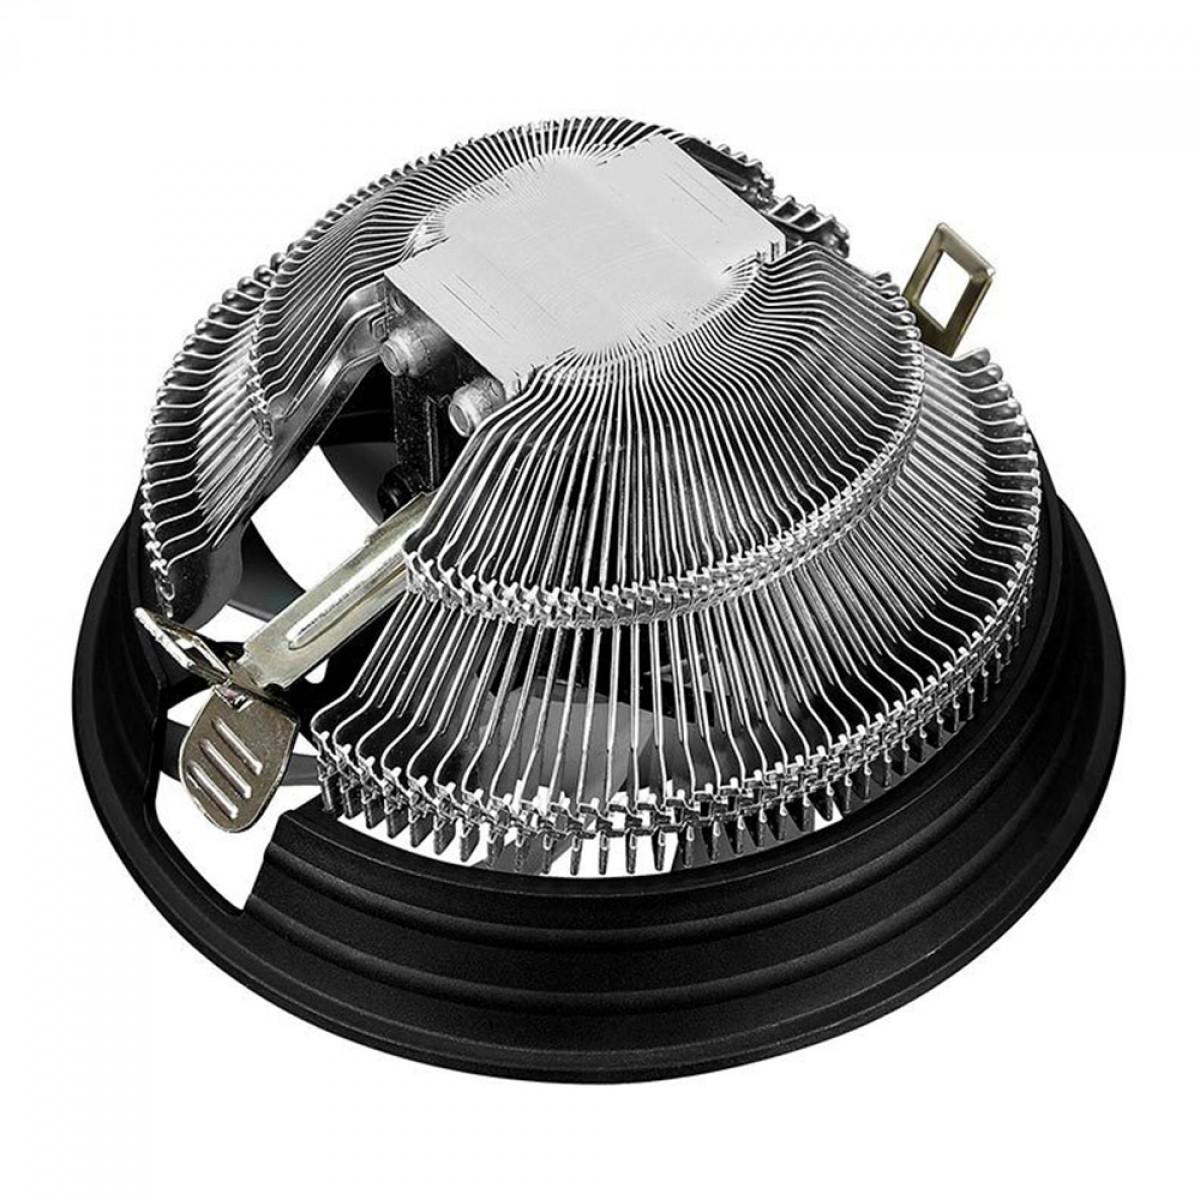 Cooler para Processador Aerocool Air Frost Plus, FRGB, 120mm, Intel-AMD